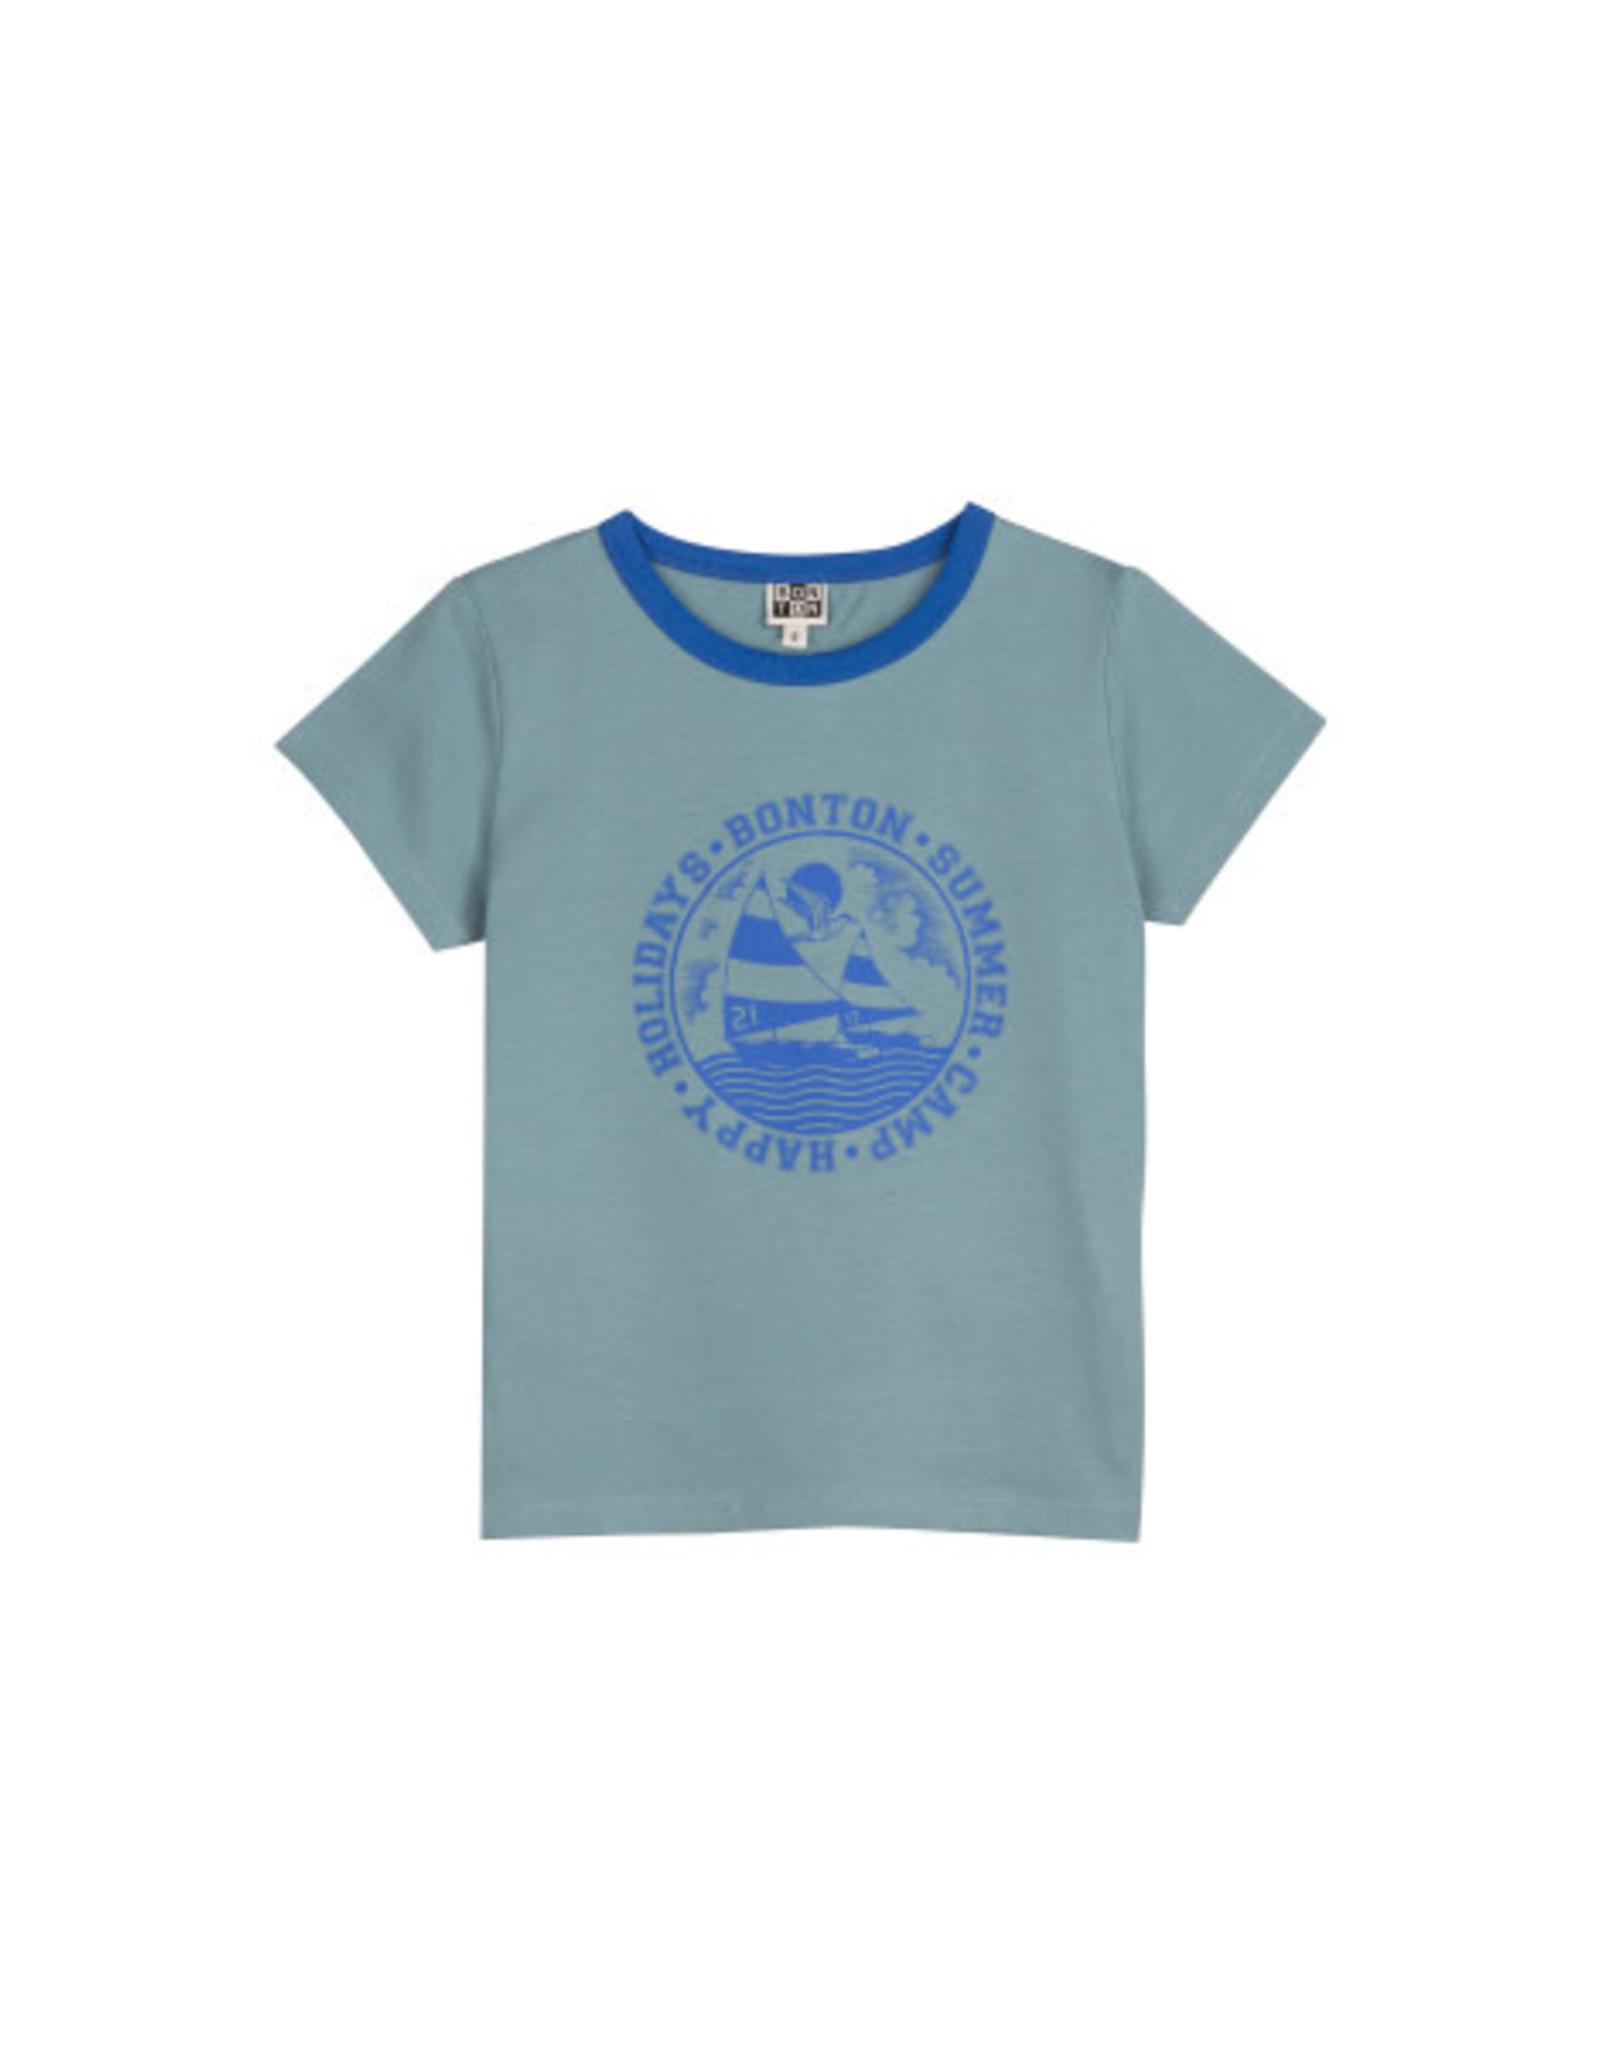 Bonton SS21 Summer t-shirt